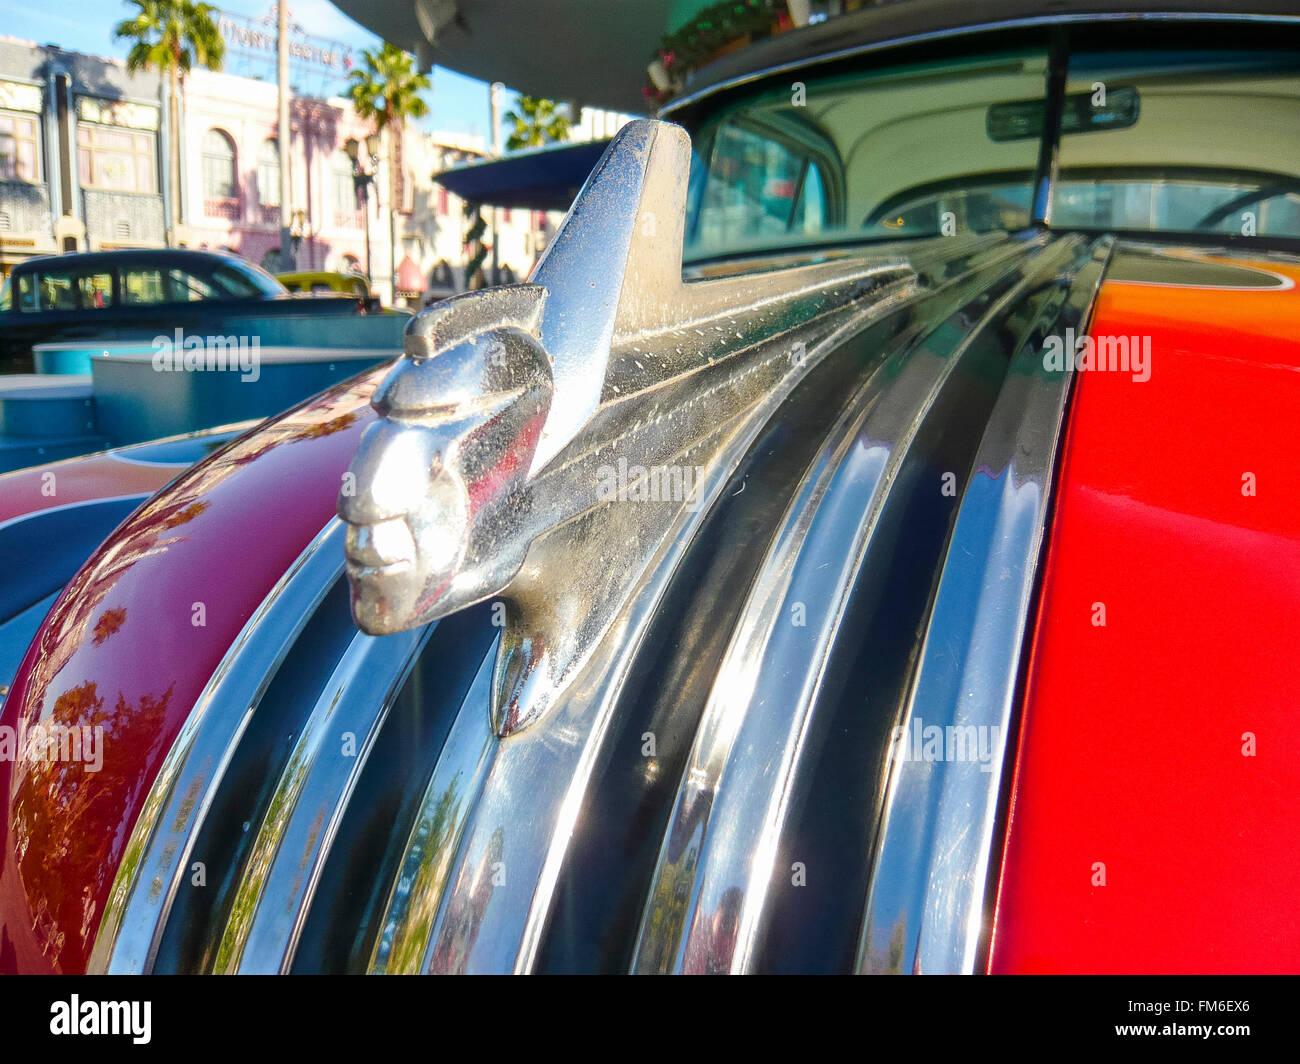 Hood ornament on a 1950's Pontiac car. - Stock Image